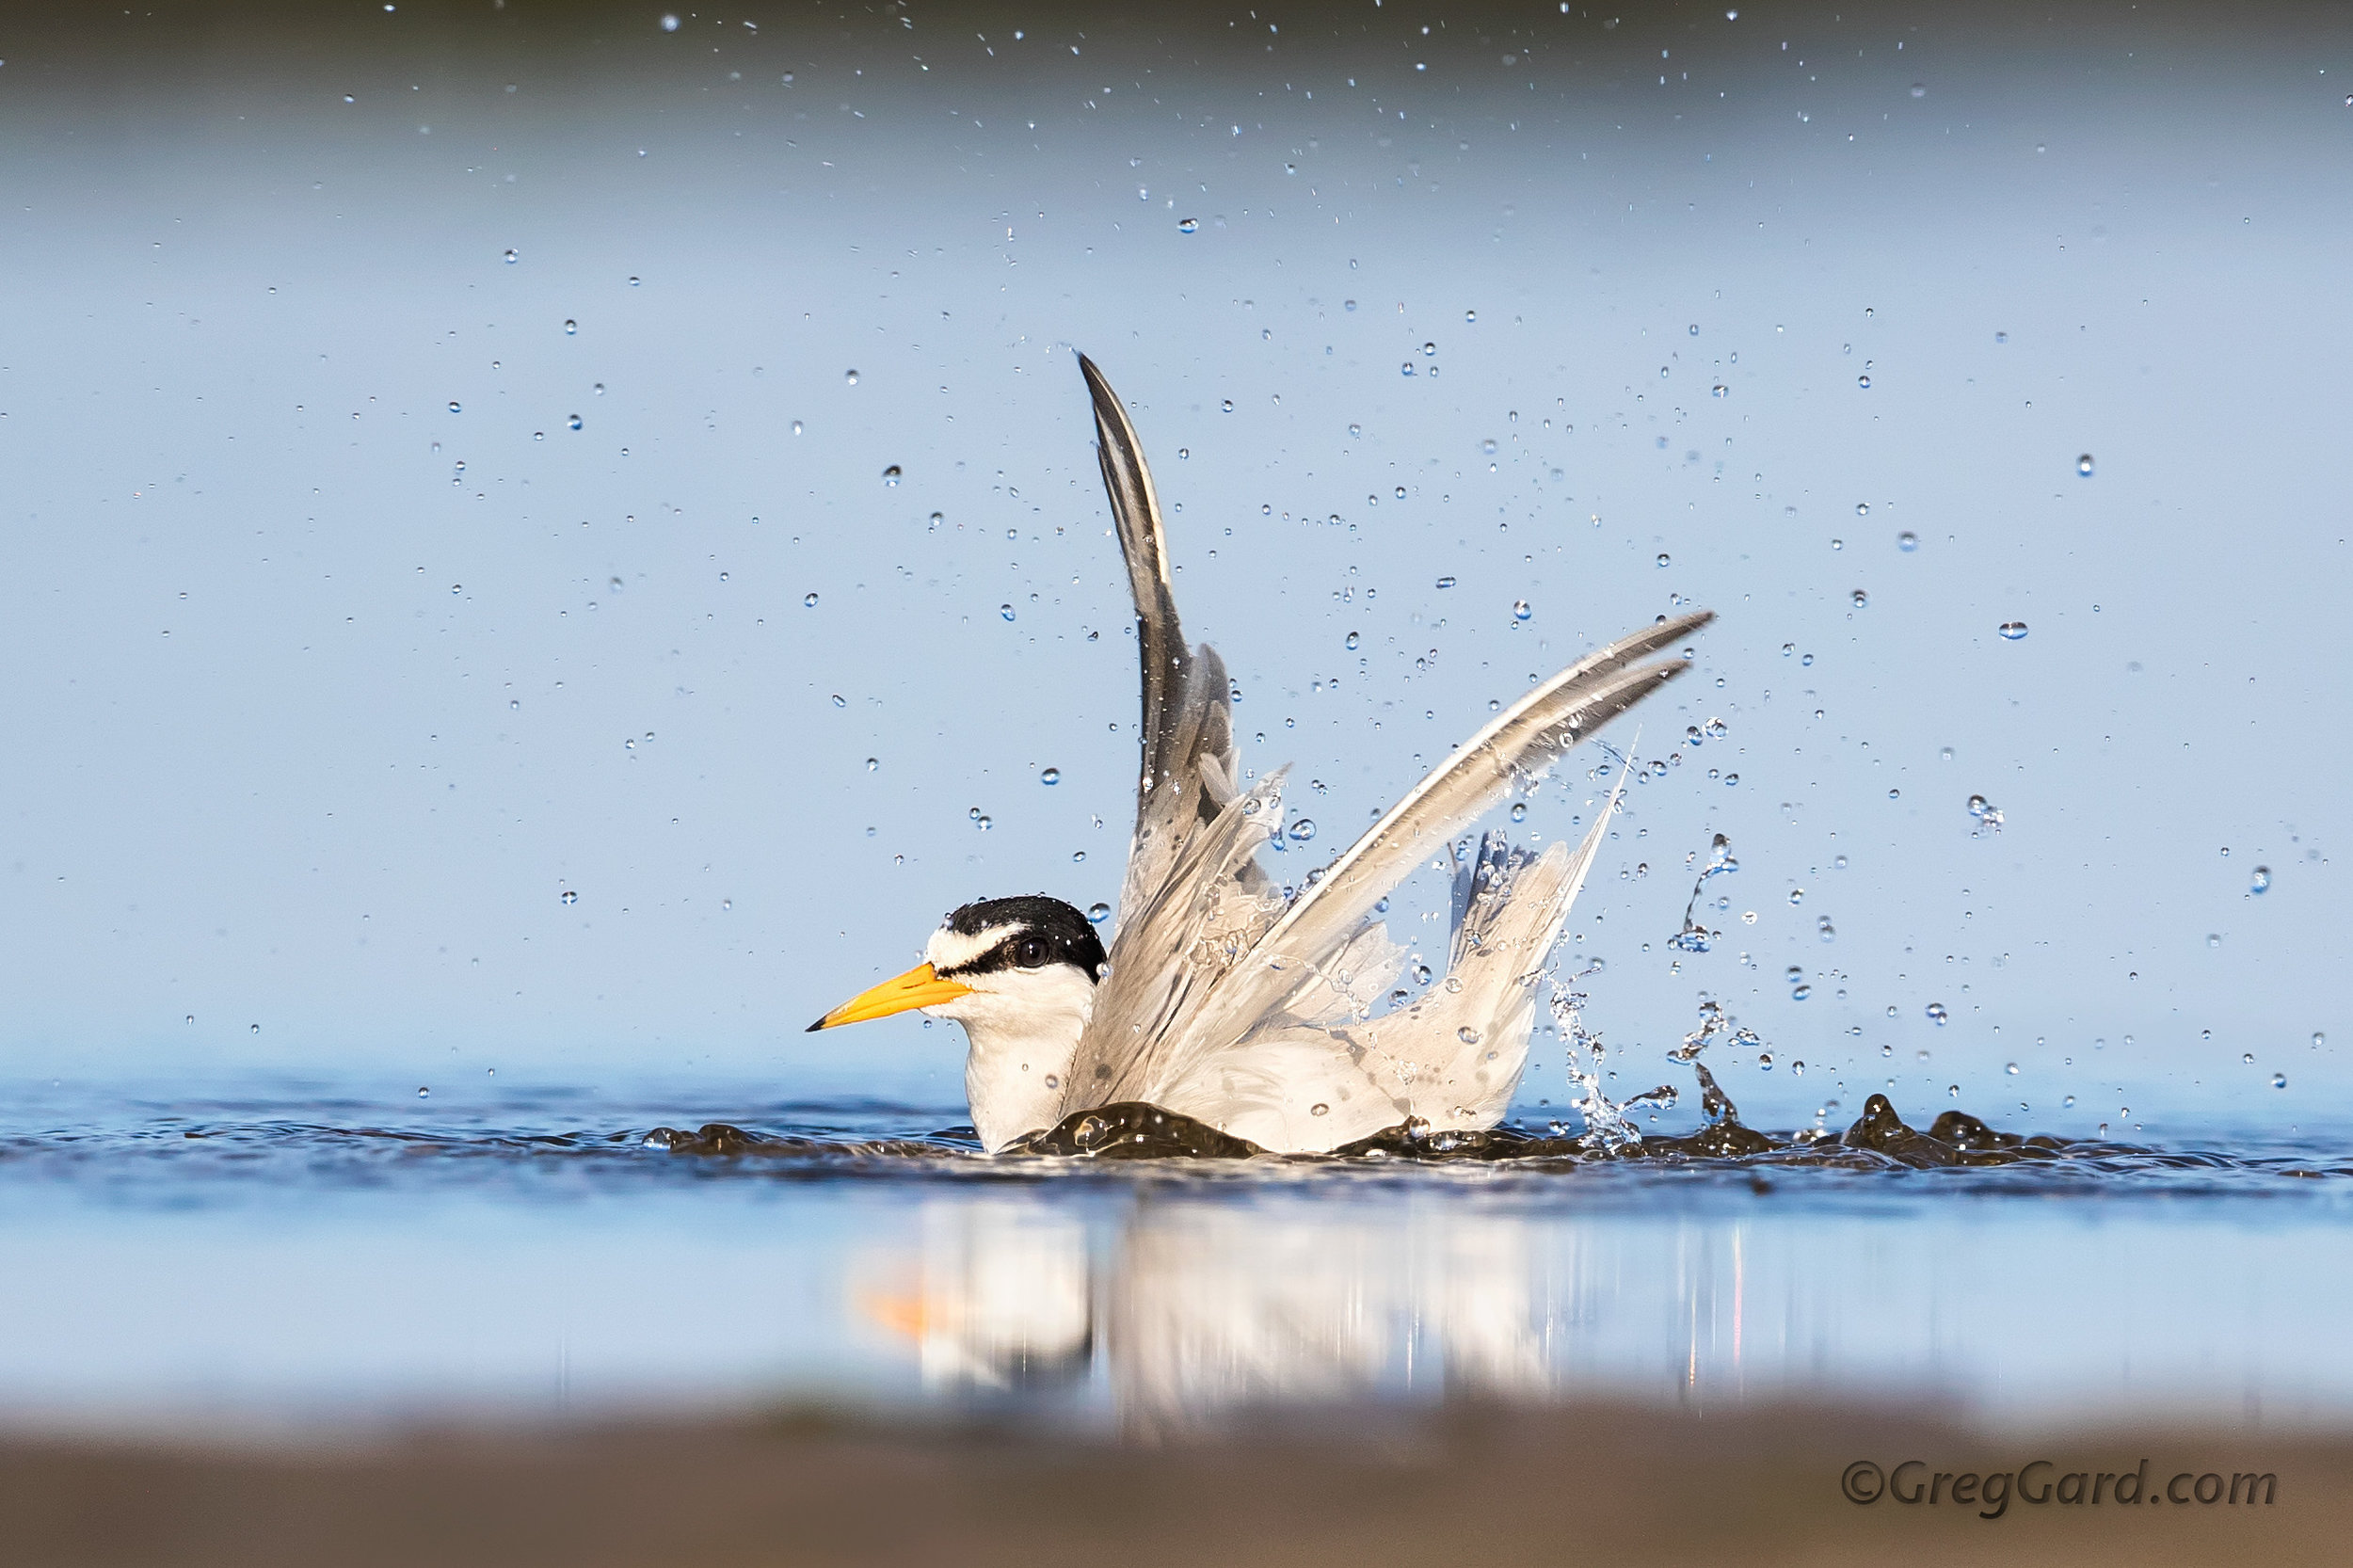 Least Tern bathing